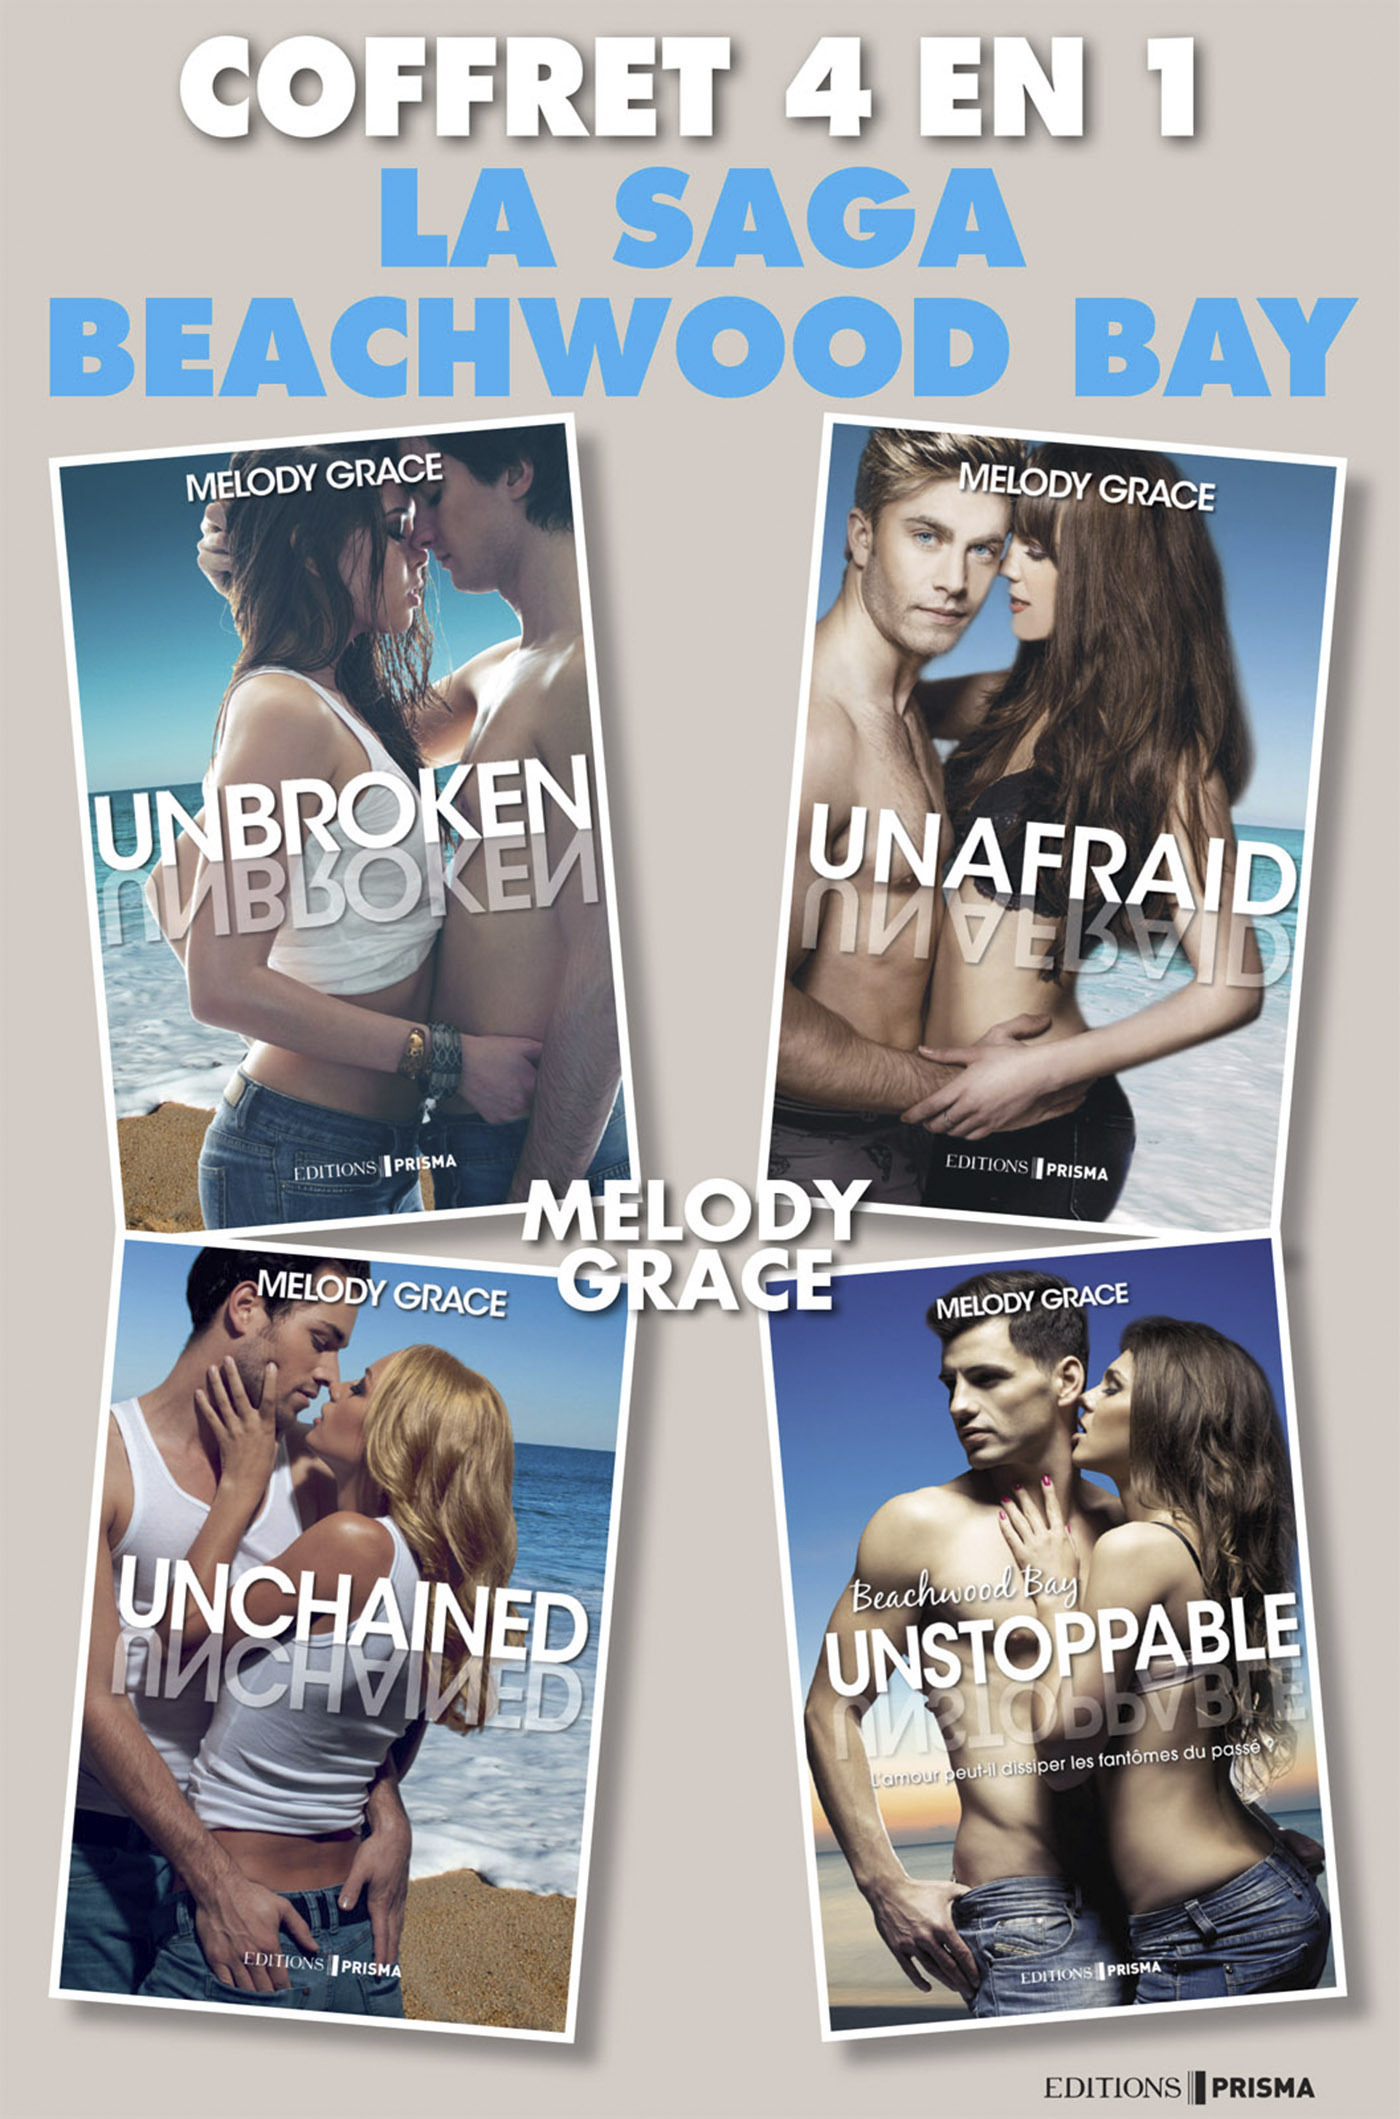 Coffret Beachwood Bay - Unbroken - Unafraid - Unchained - Unlimited